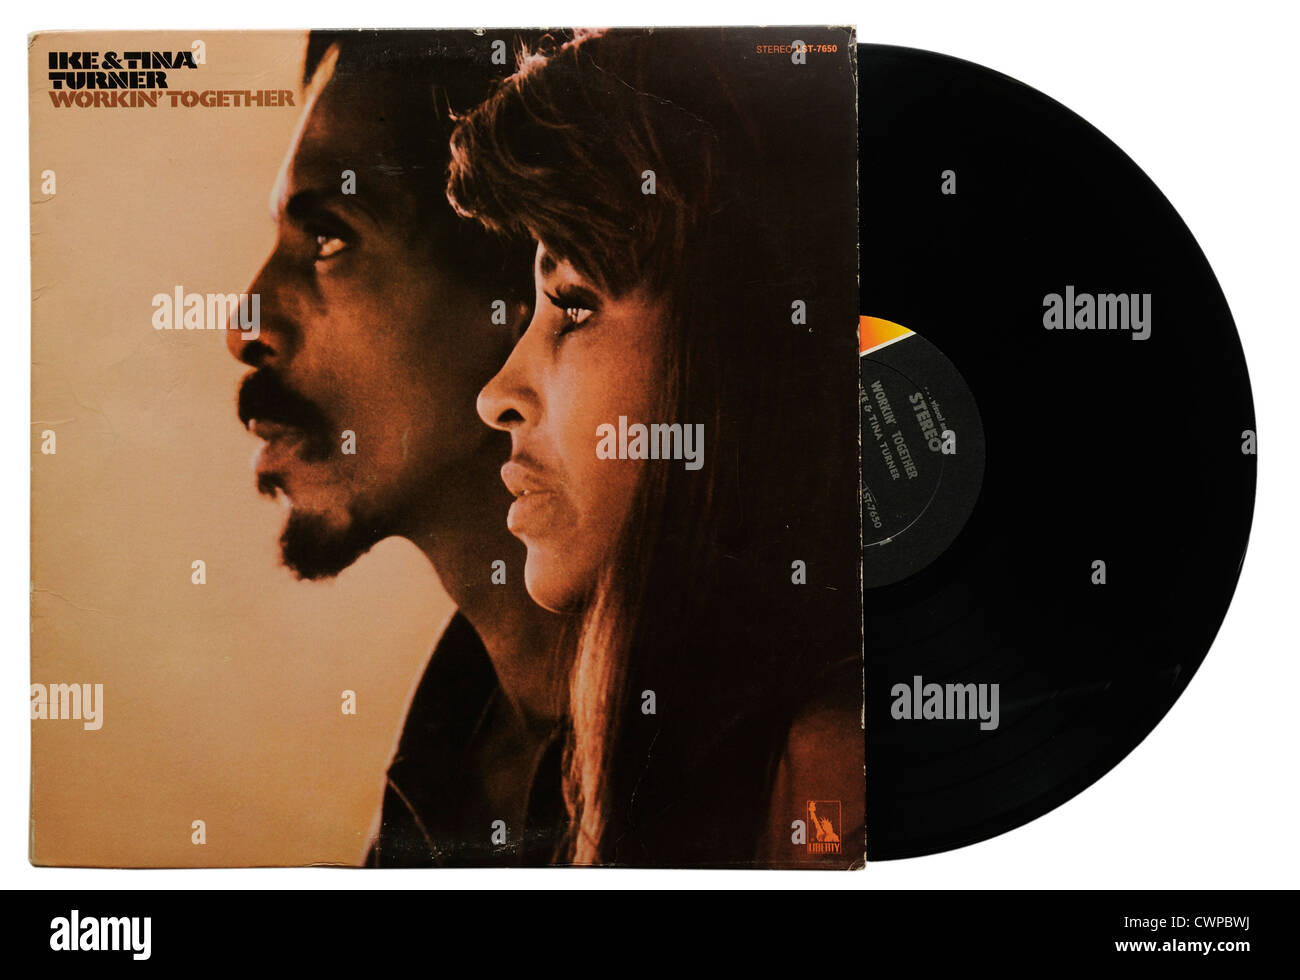 Ike and Tina Turner Working Together album - Stock Image